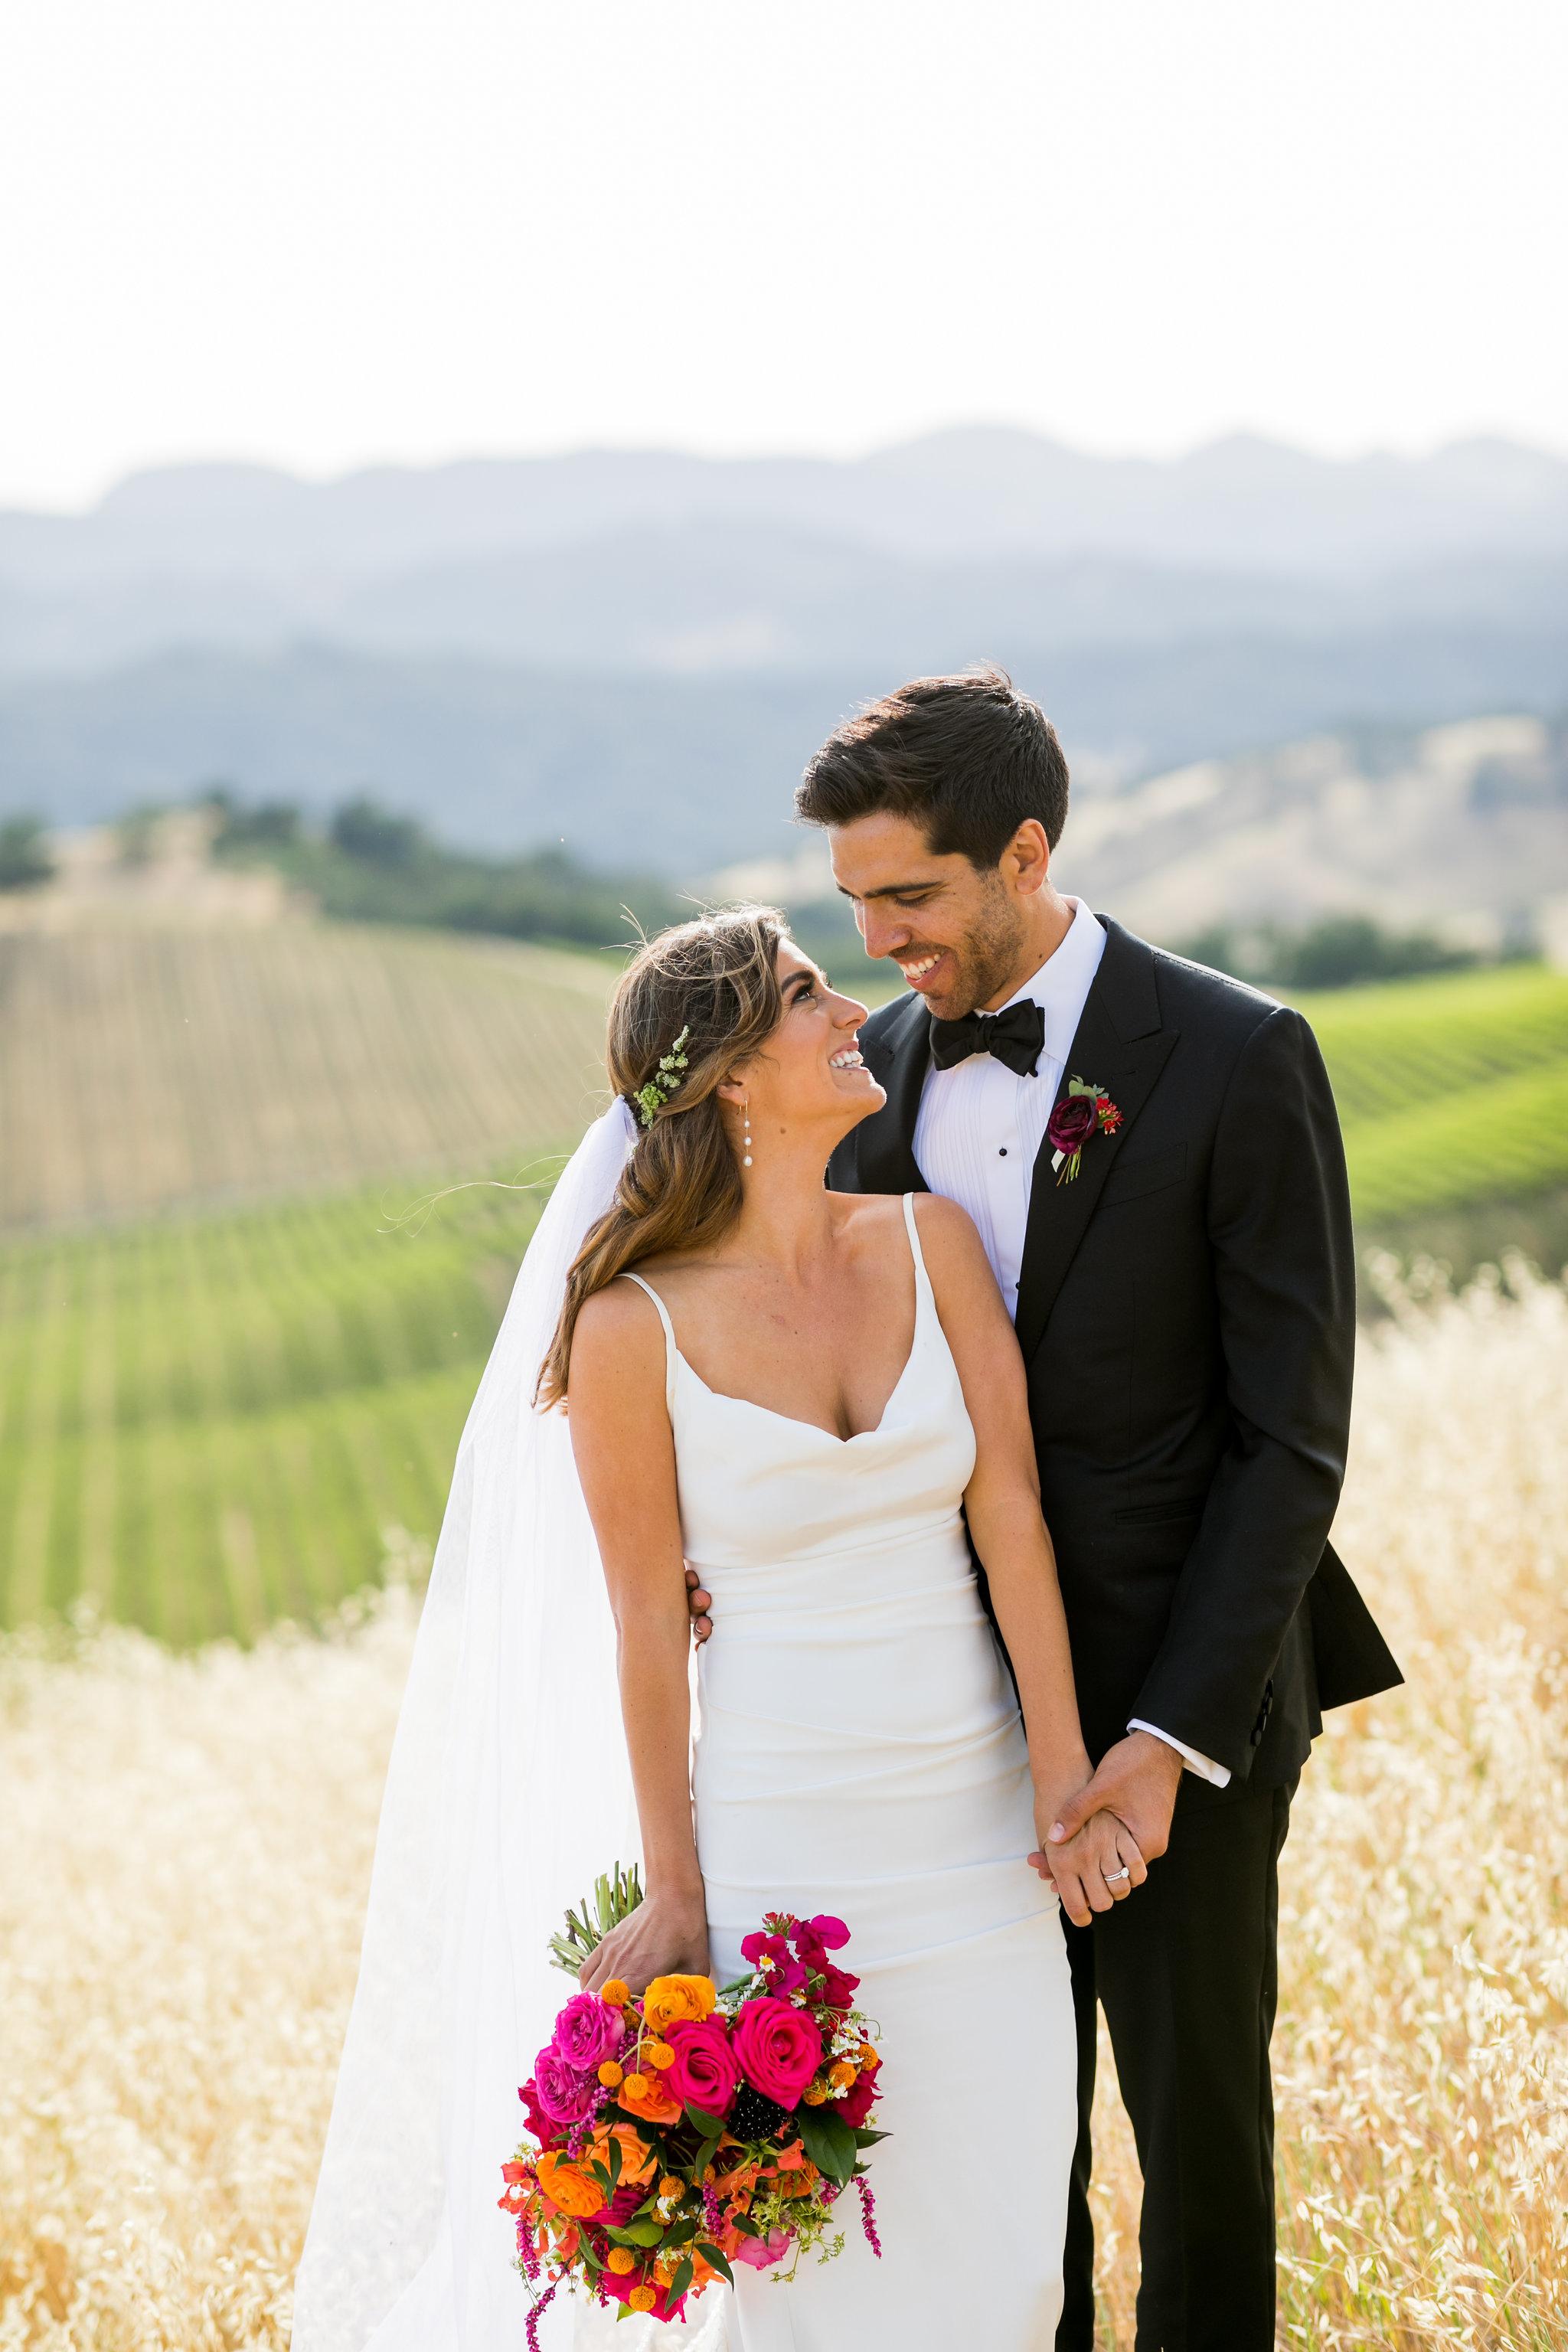 cameron_ingalls-the_farm_winery-madsen-0565.jpg